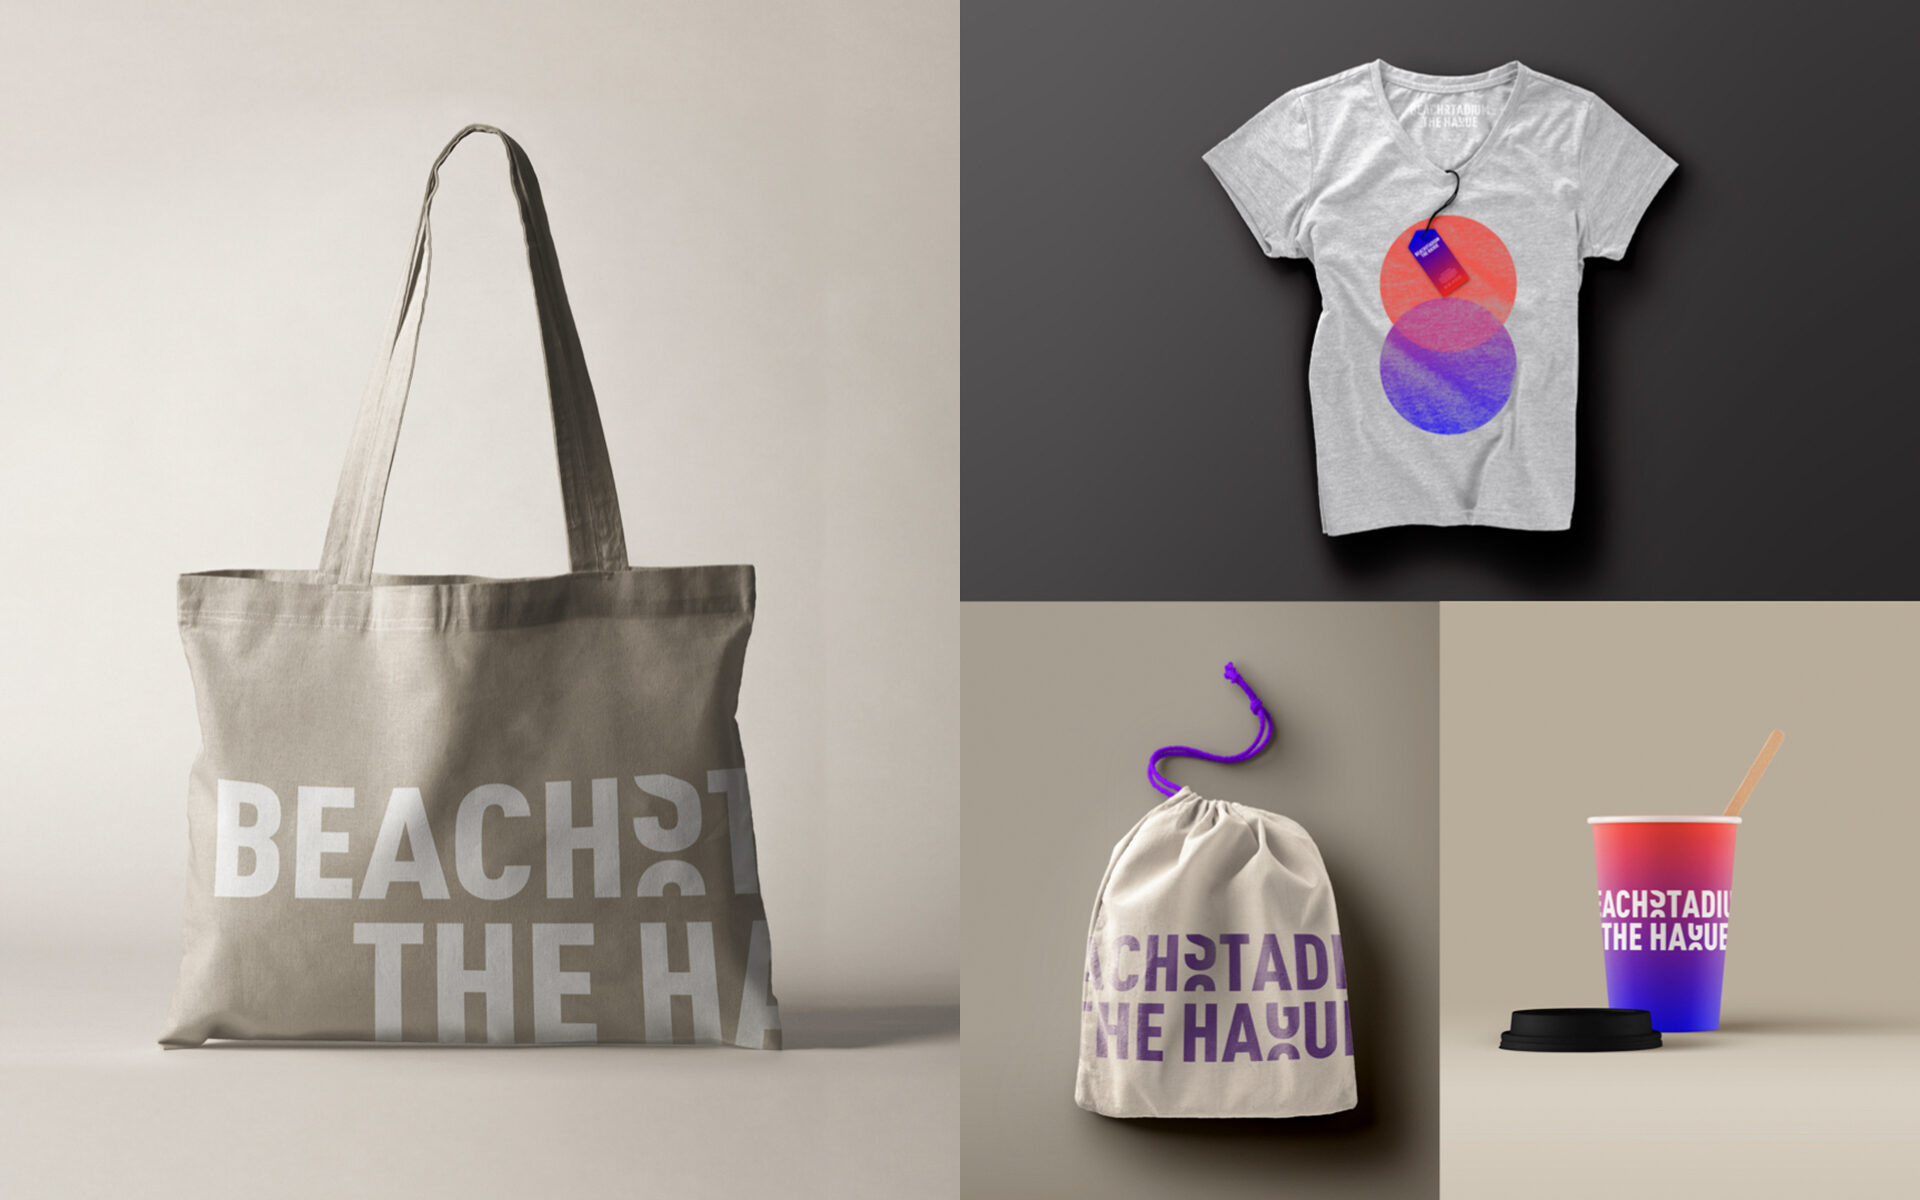 Beach Stadium Den Haag DAY Creative Strategic Consultancy Experience Concepts Brand Design merchandise